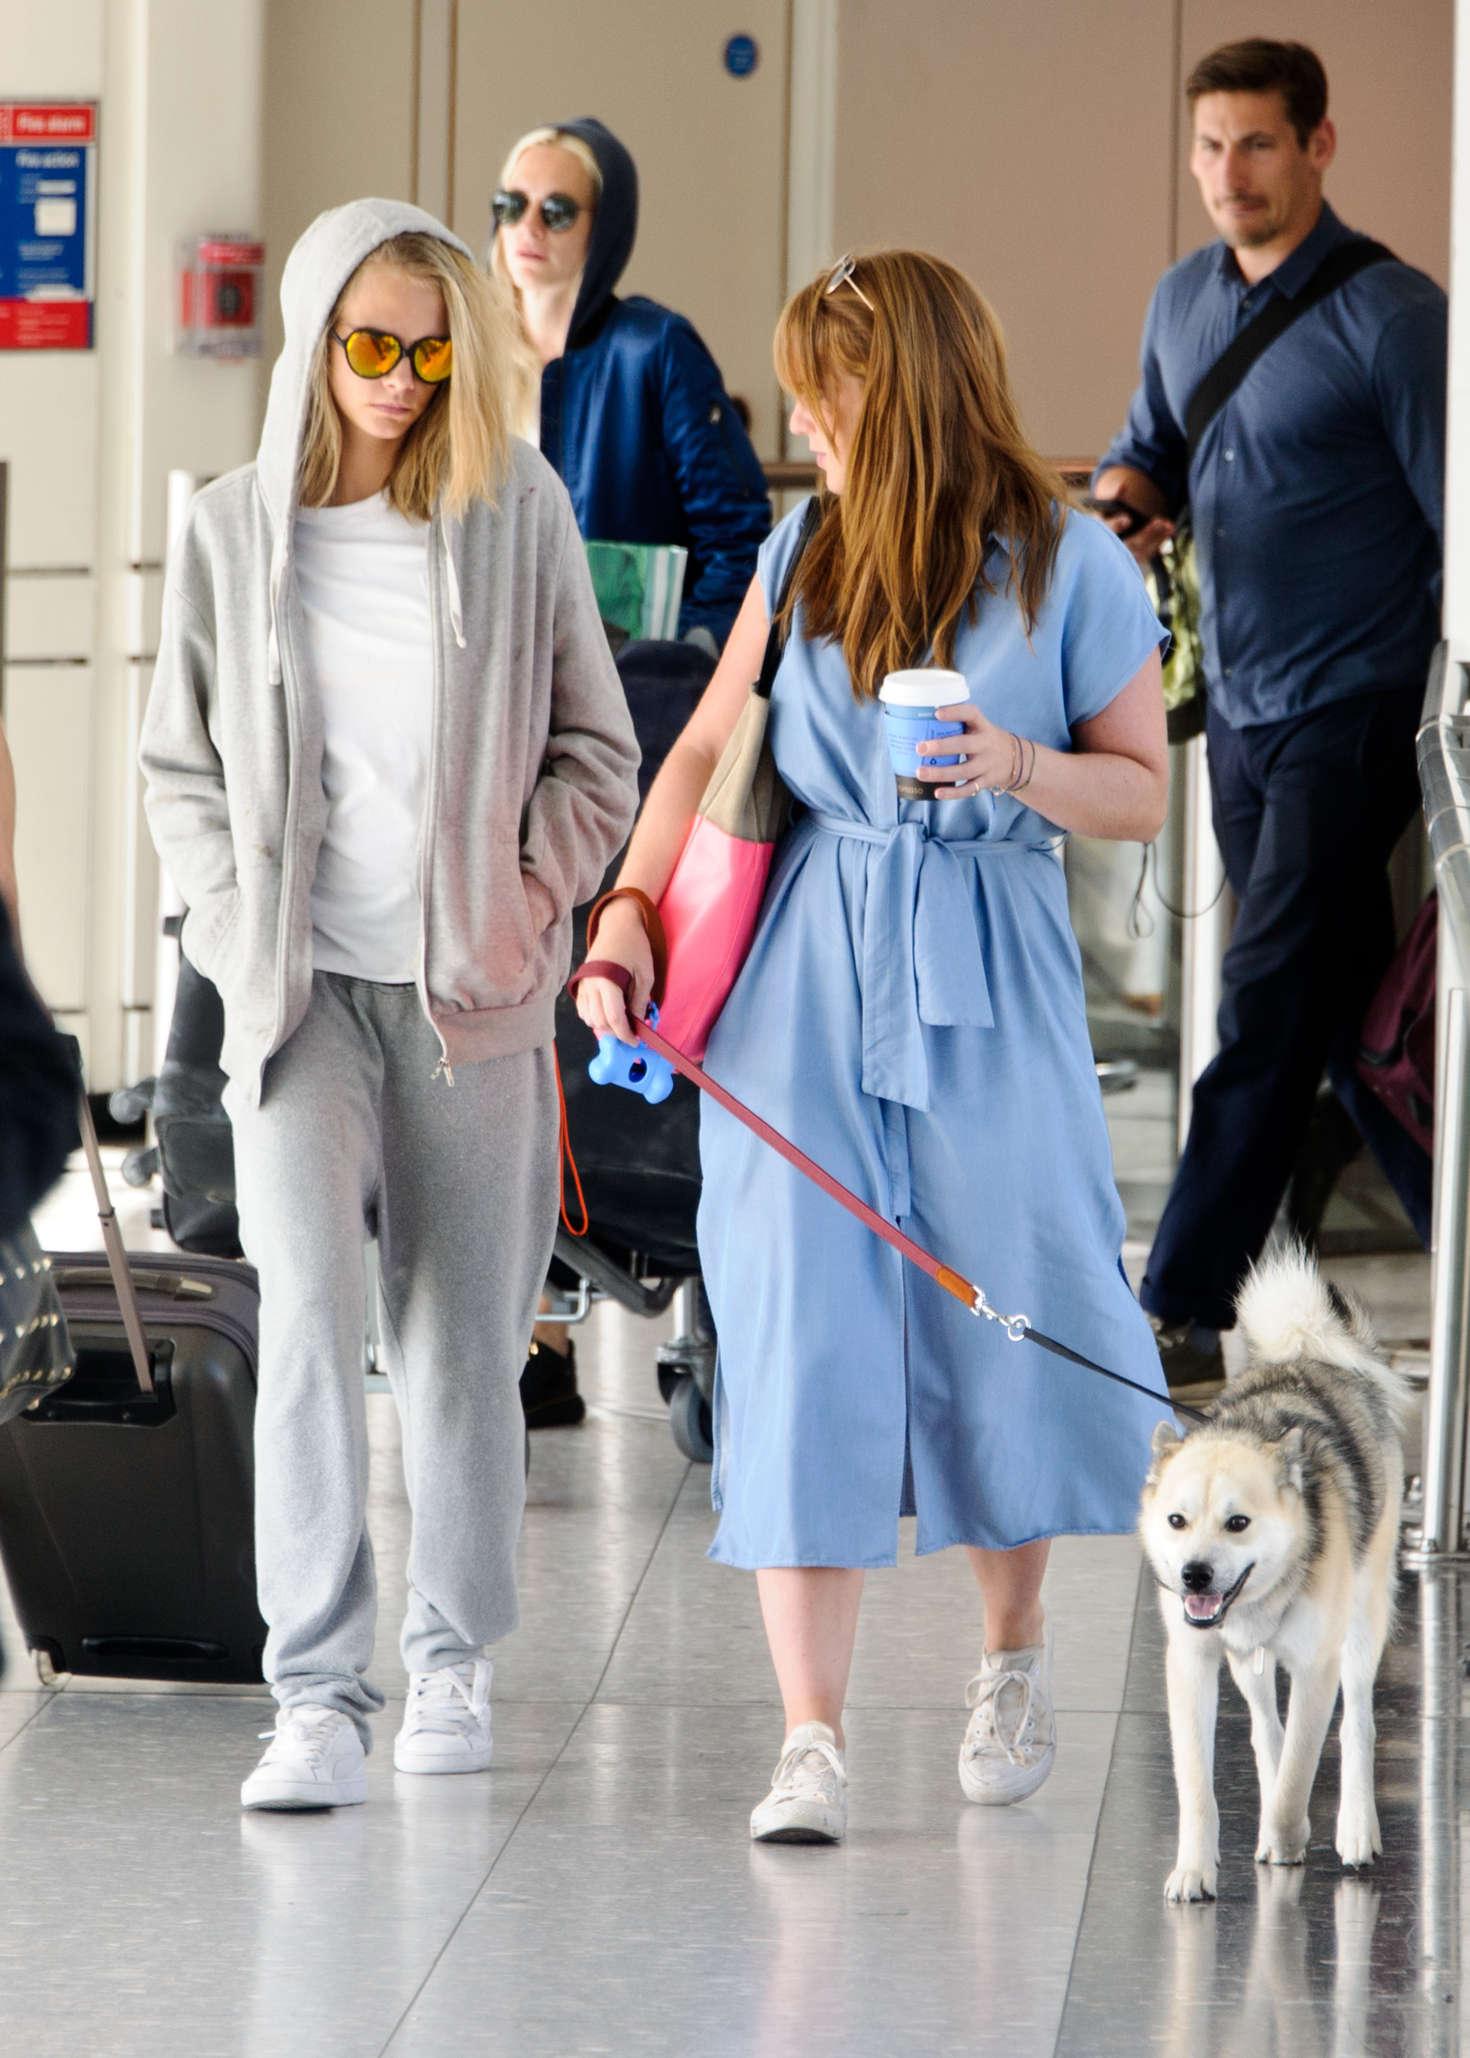 Cara Delevingne 2016 : Cara and Poppy Delevingne Arrive at Heathrow Airport -13